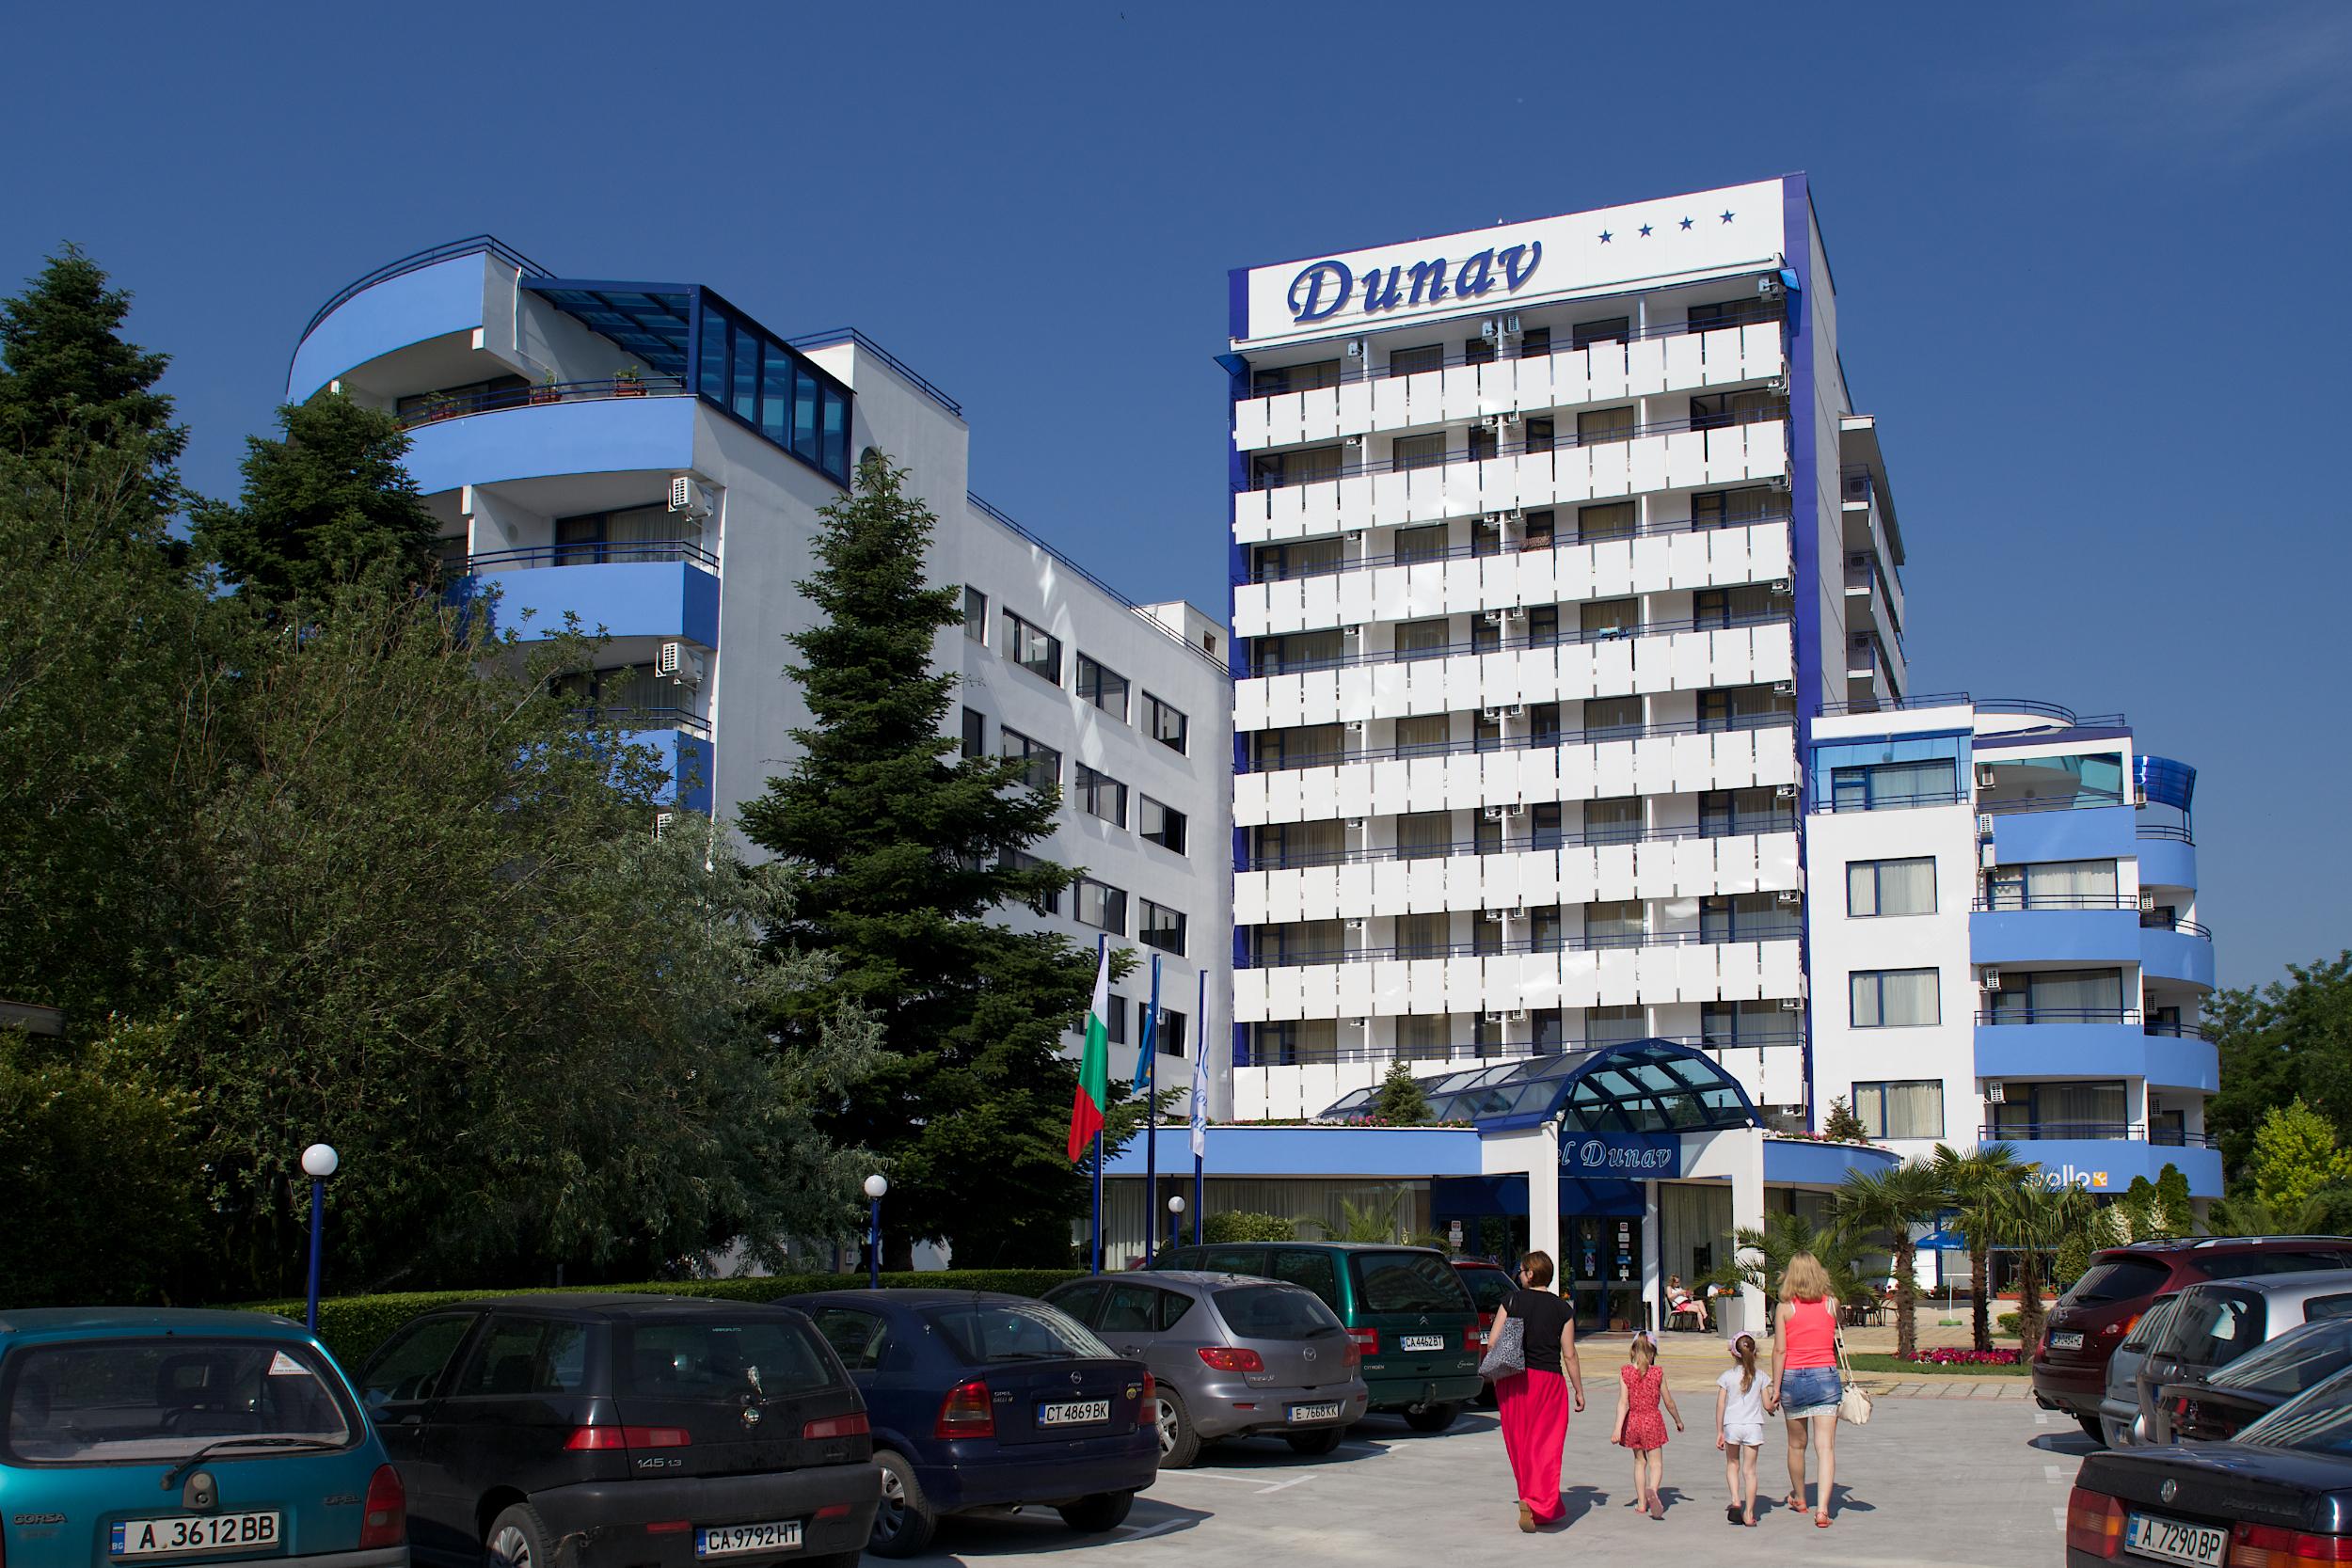 Letovanje Bugarska autobusom, Sunčev breg, Hotel Dunav, eksterijer